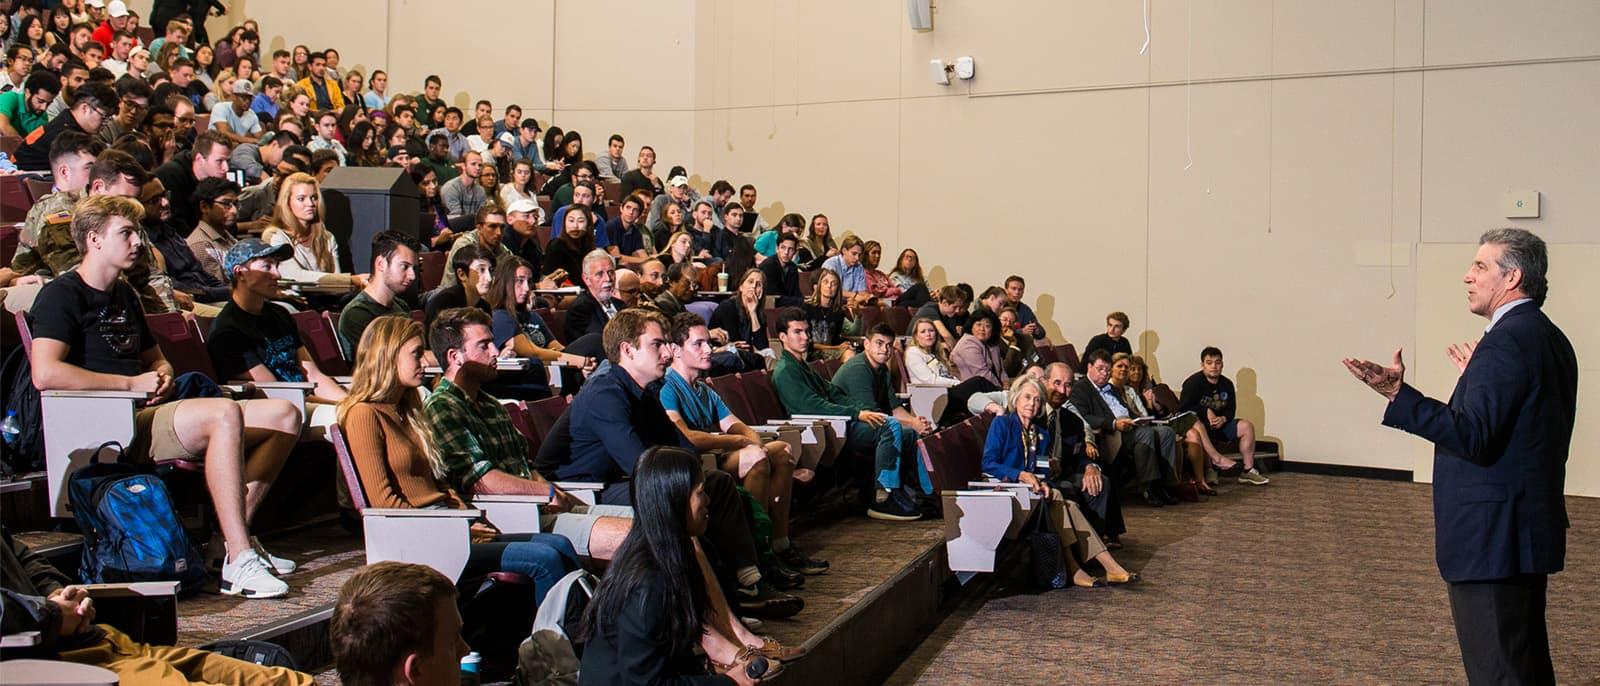 Craig Menear speaking at the 2017 Warrington Lecture